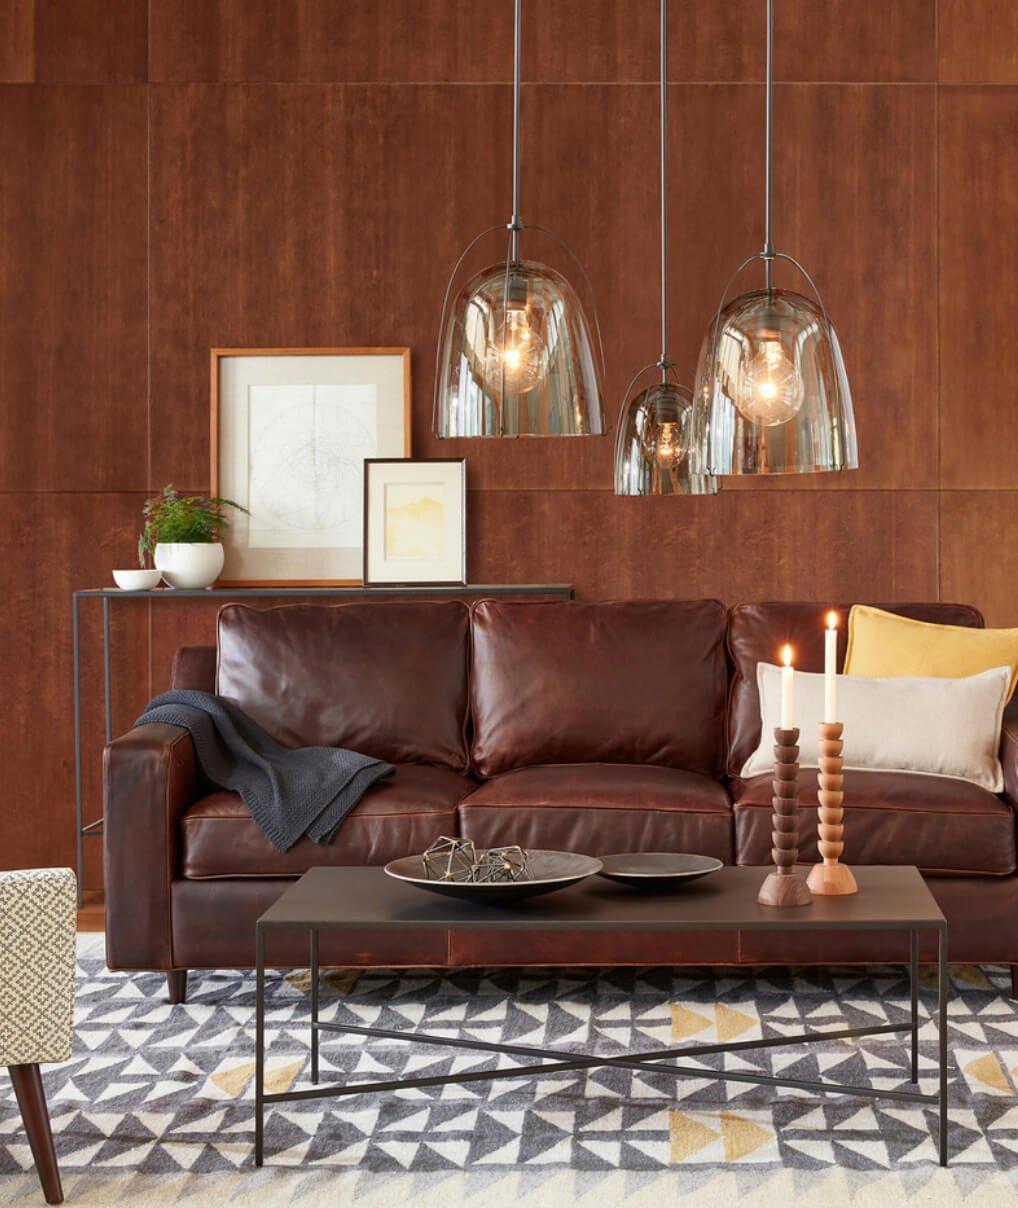 12 living room rug ideas